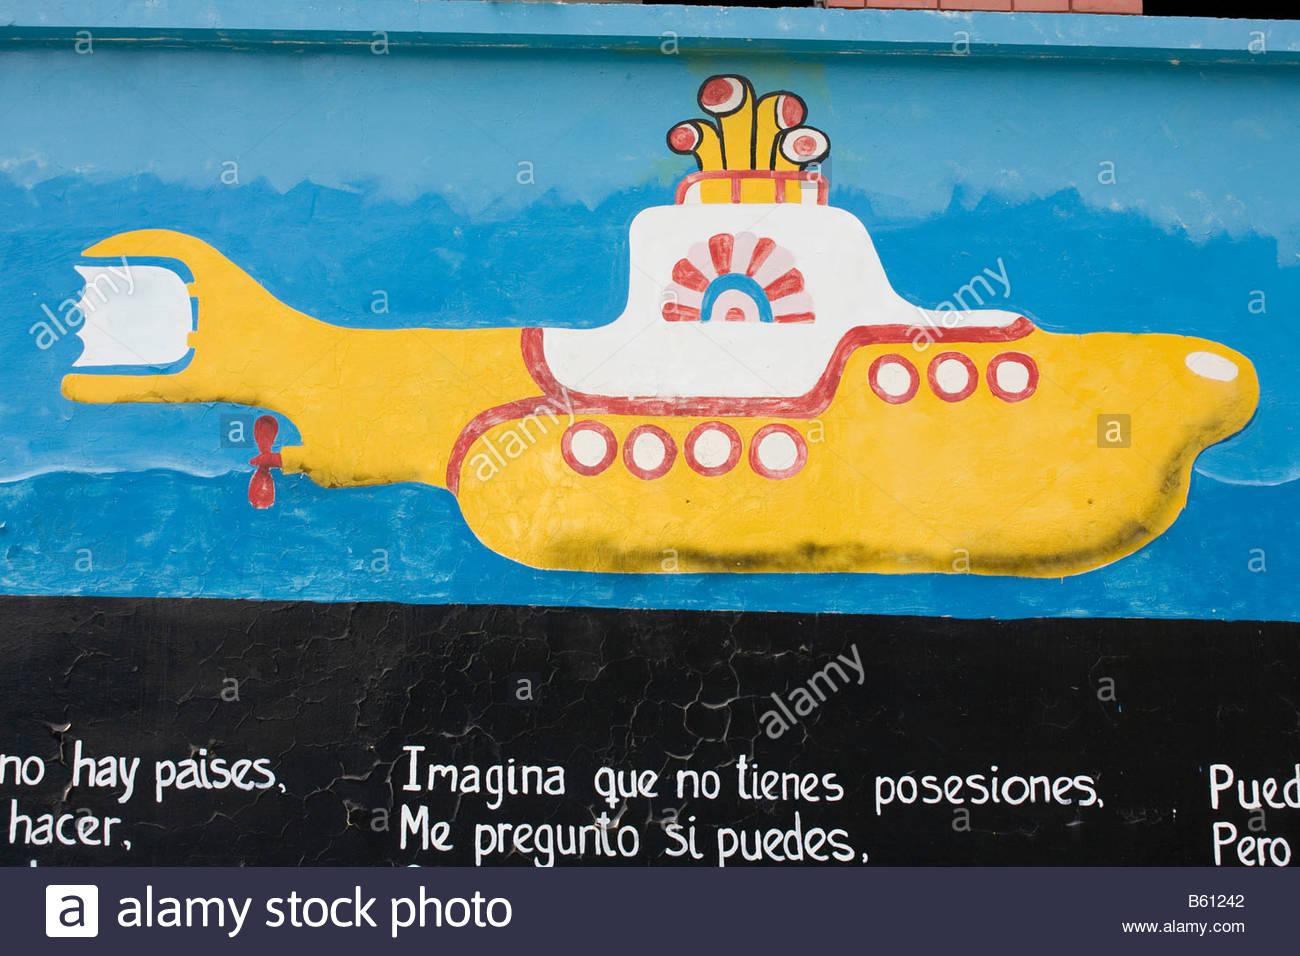 Beatles song, Yellow Submarine, as a graffiti, Merida, Venezuela, South America - Stock Image